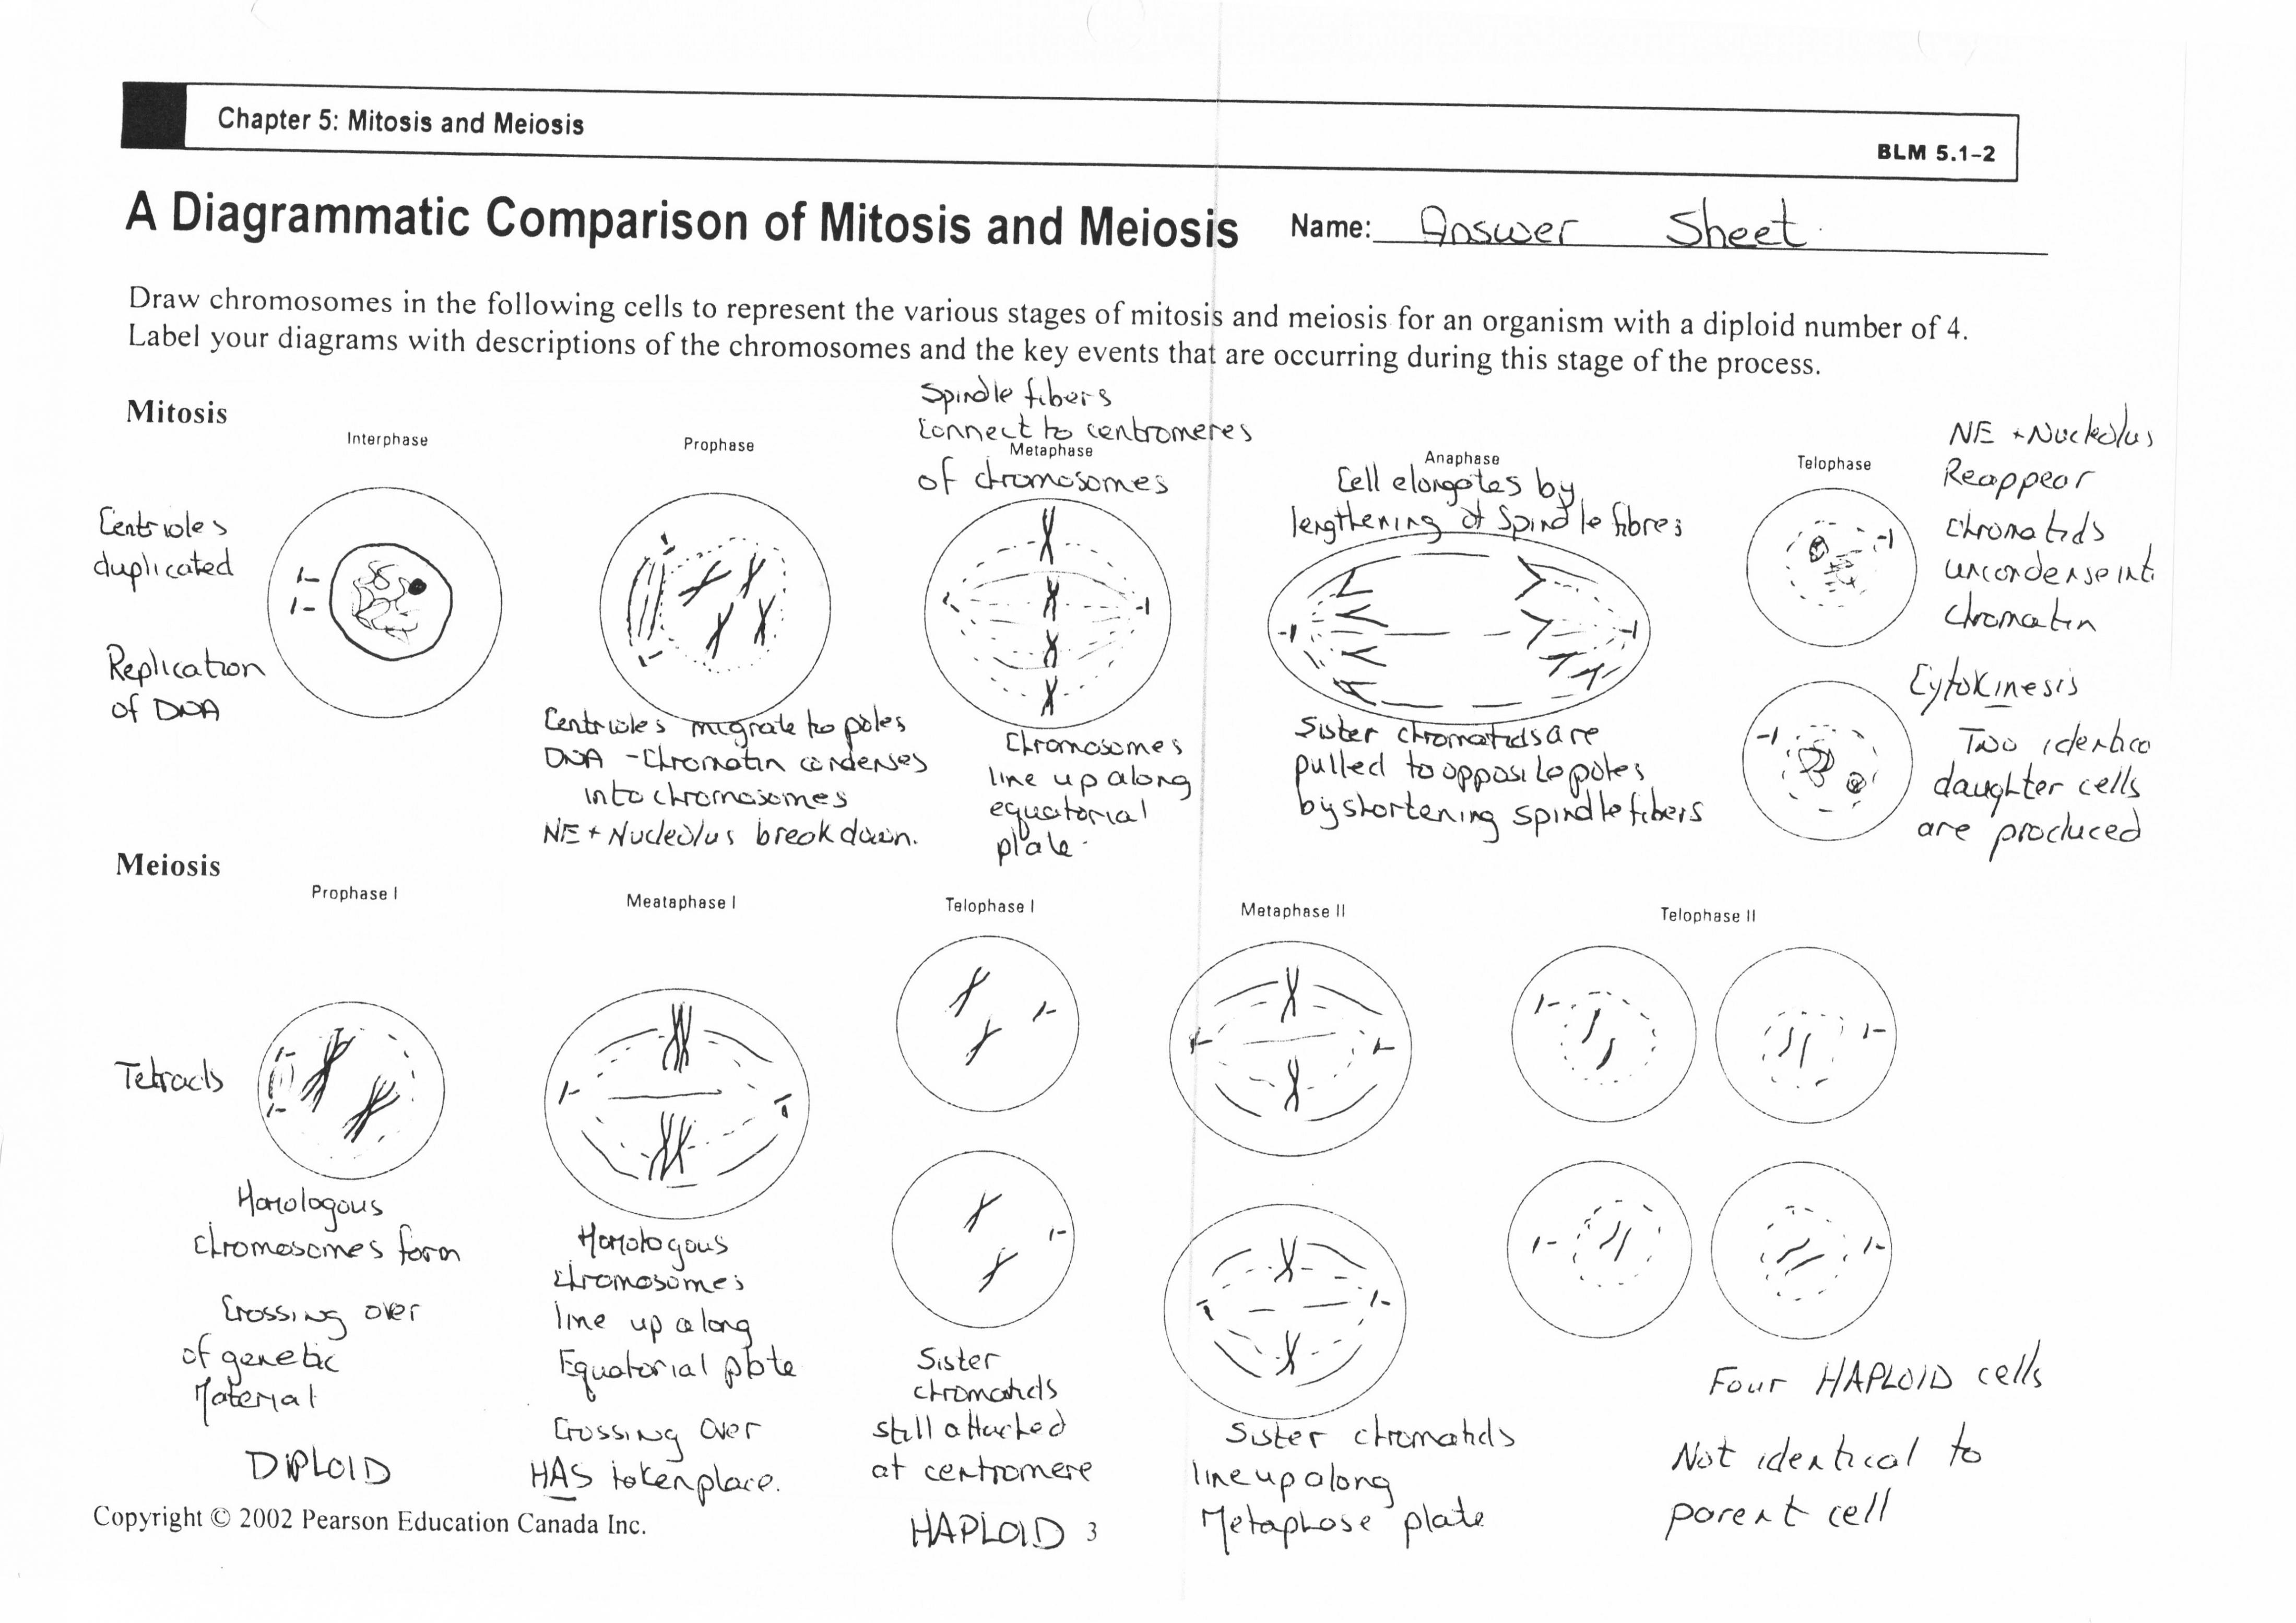 Mitosis Meiosis Venn Diagram 75 Unmistakable Comparing Mitosis And Meiosis Worksheet Key